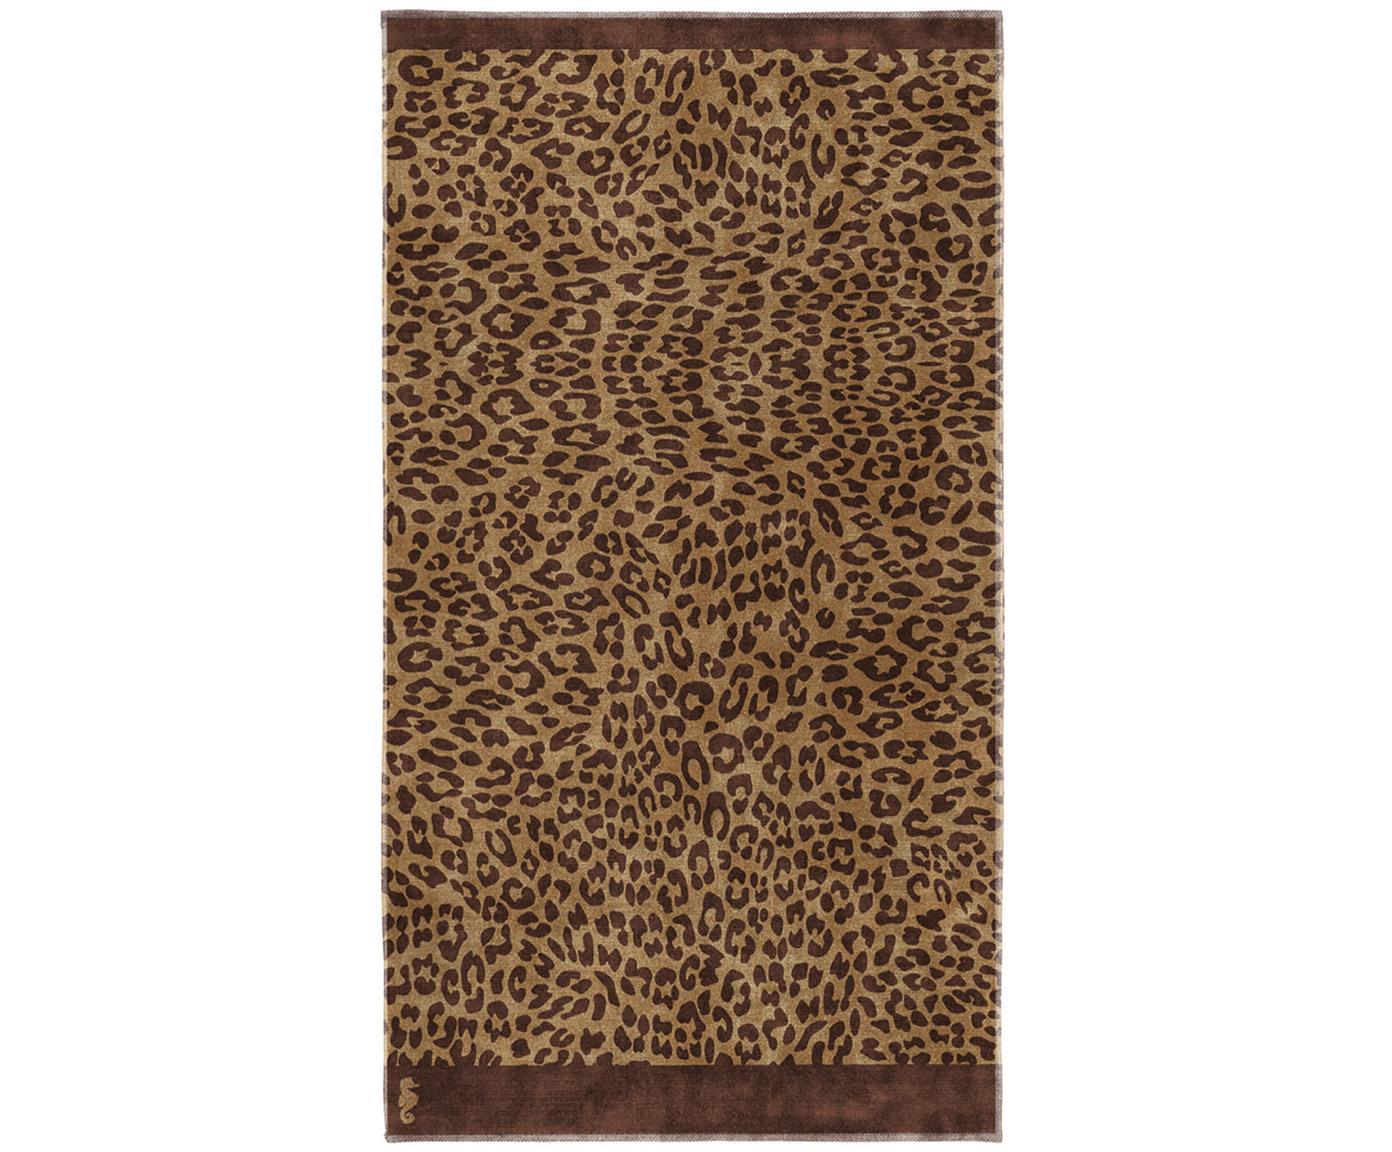 Strandtuch Jaguar mit Animalprint, Webart: Velours, Beige, Braun, 100 x 180 cm